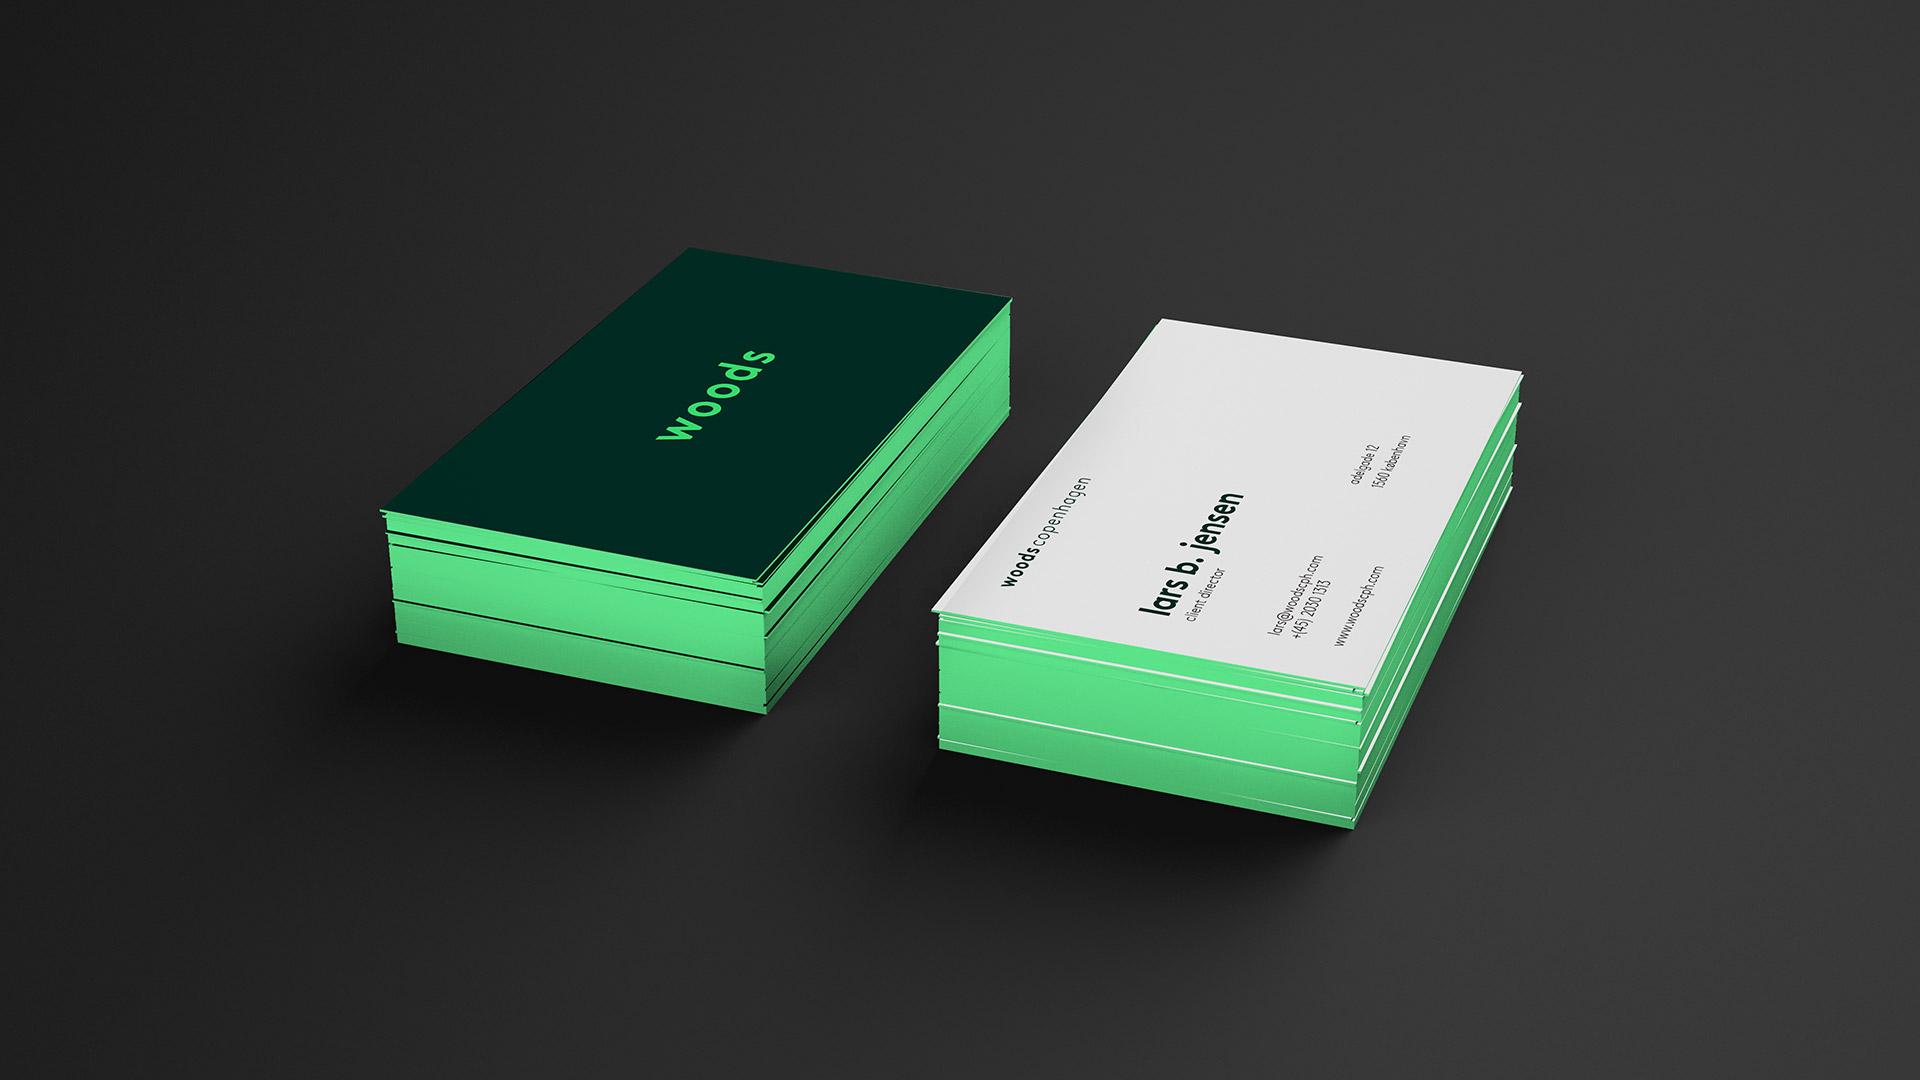 Tetris - Woods - Visuel identitet - Visitkort